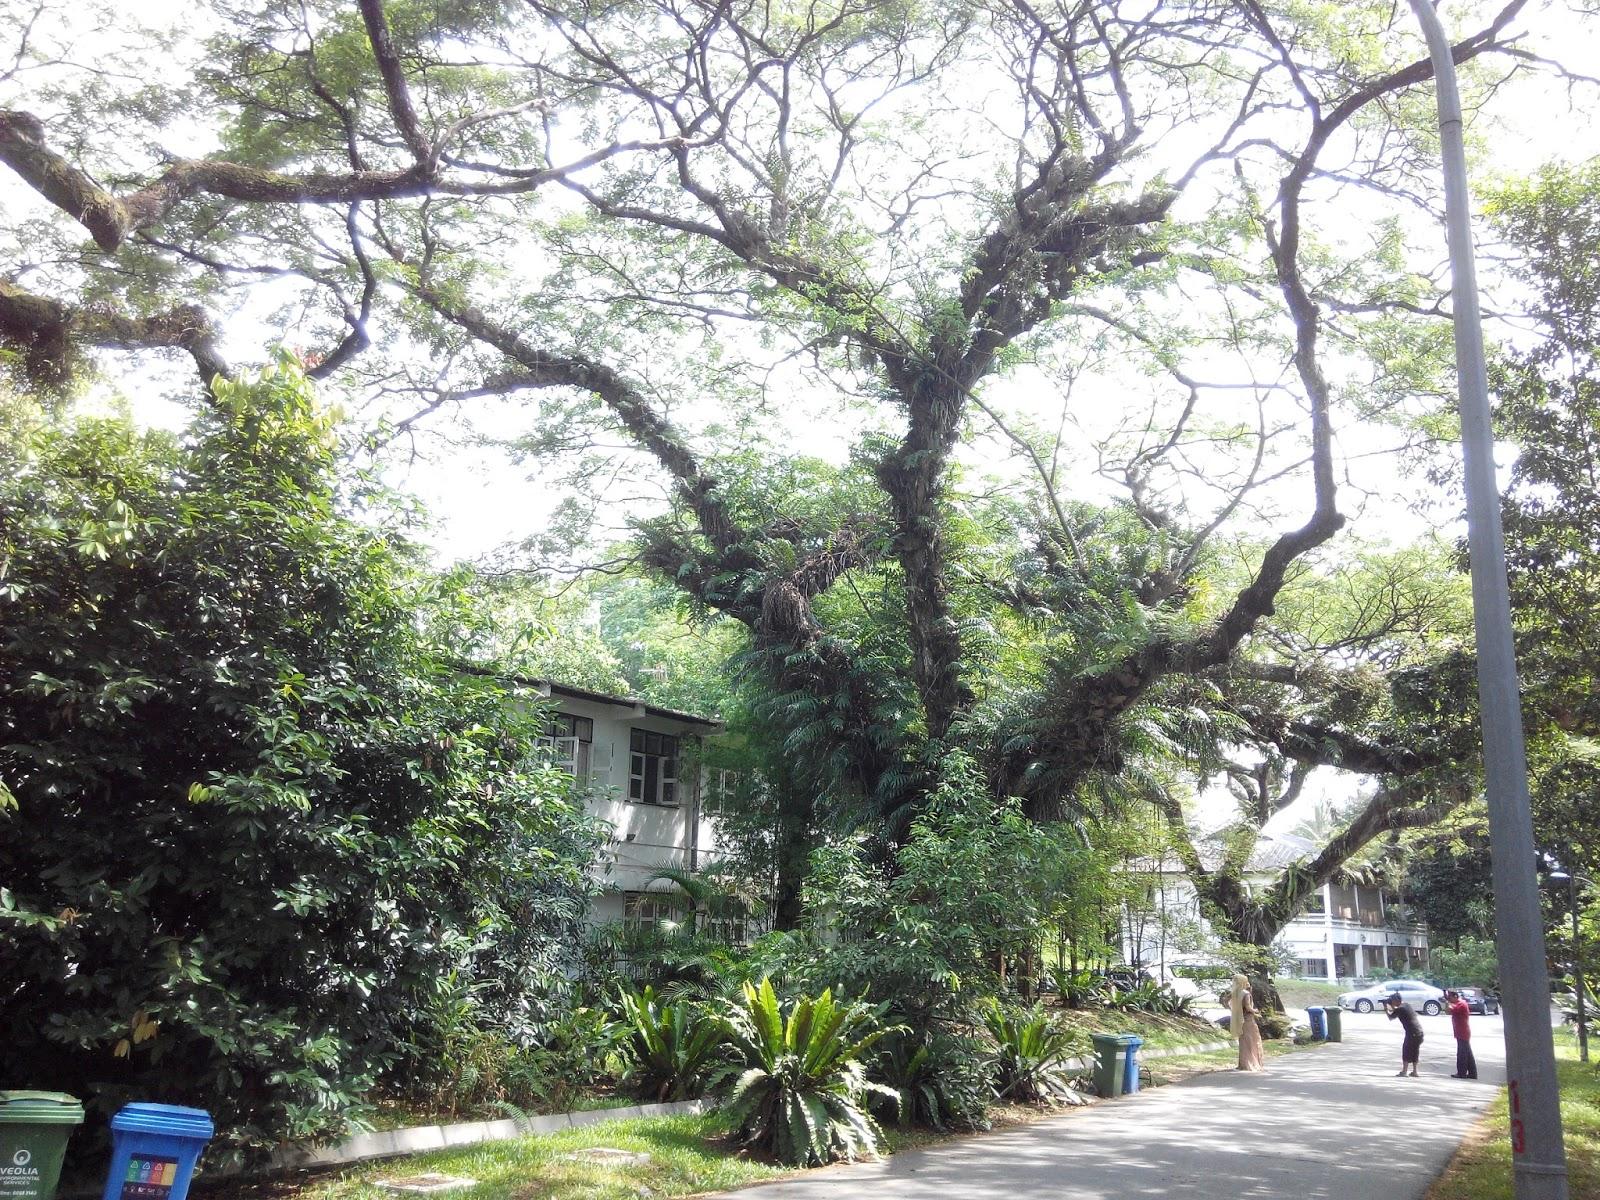 InSaNeTz The English Colonial Houses and Rain Tree of Jalan Hang Jebat